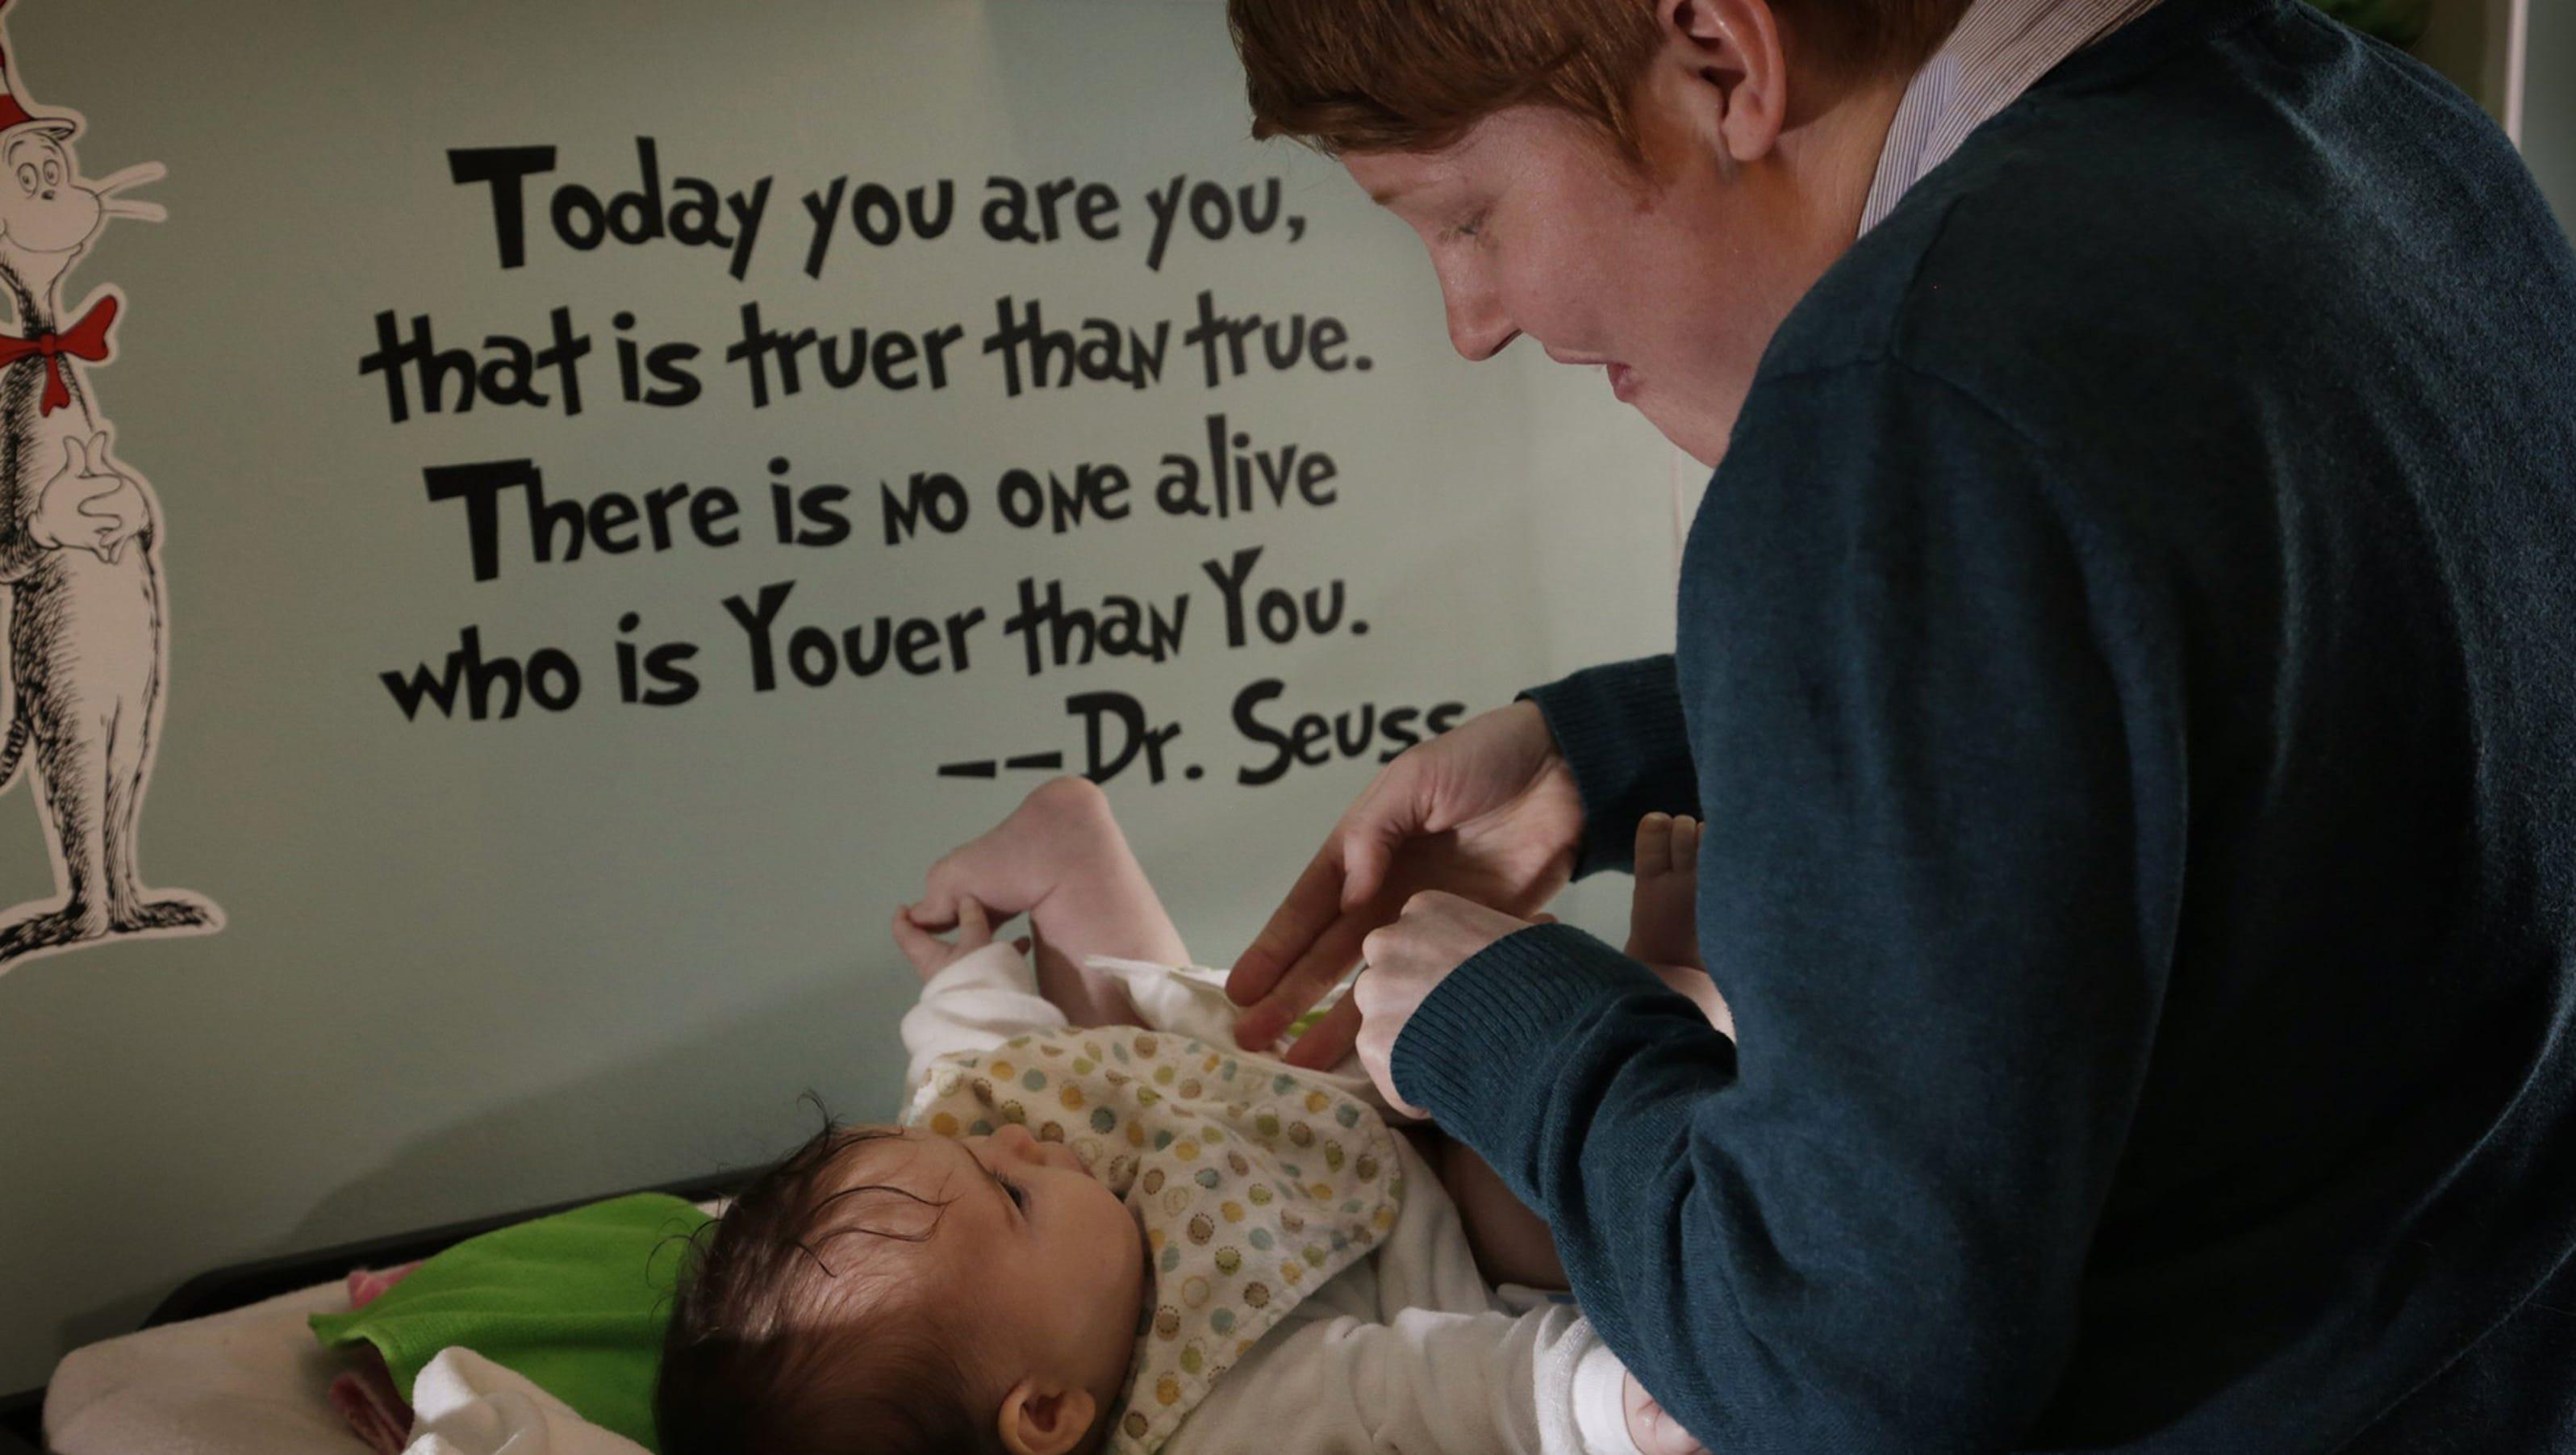 Should Pediatricians Refuse To Treat >> Jesus Take The Wheel Pediatrician Refuse To Treat Baby With 2 Moms